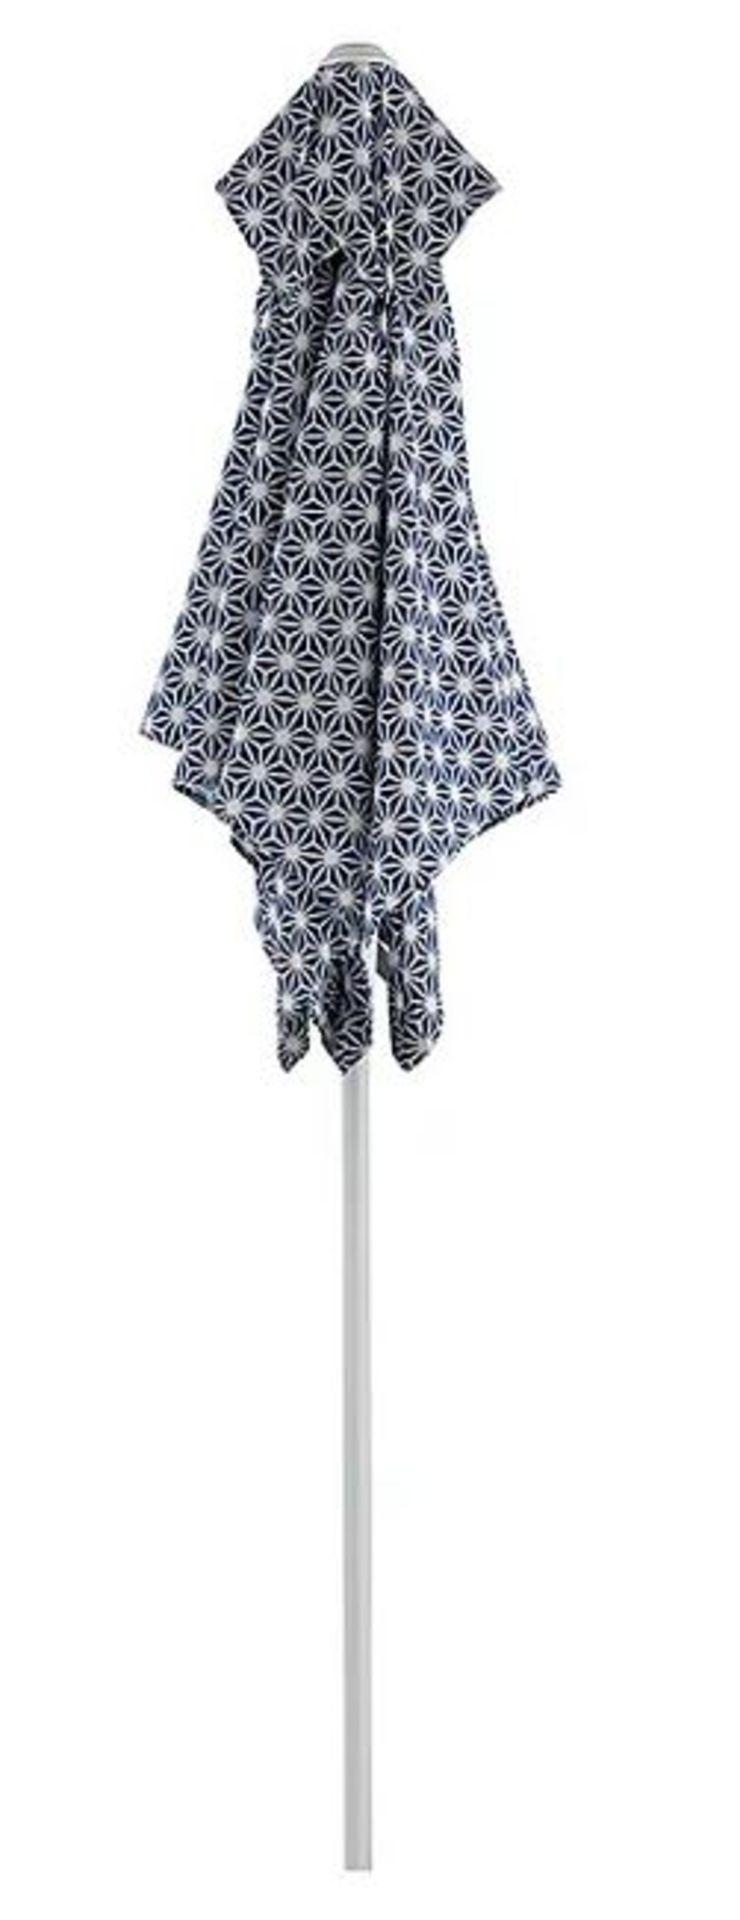 (2I) 3x Items. 2x Blue White Geometric Pattern Garden Recliners & 1x Matching Parasol.